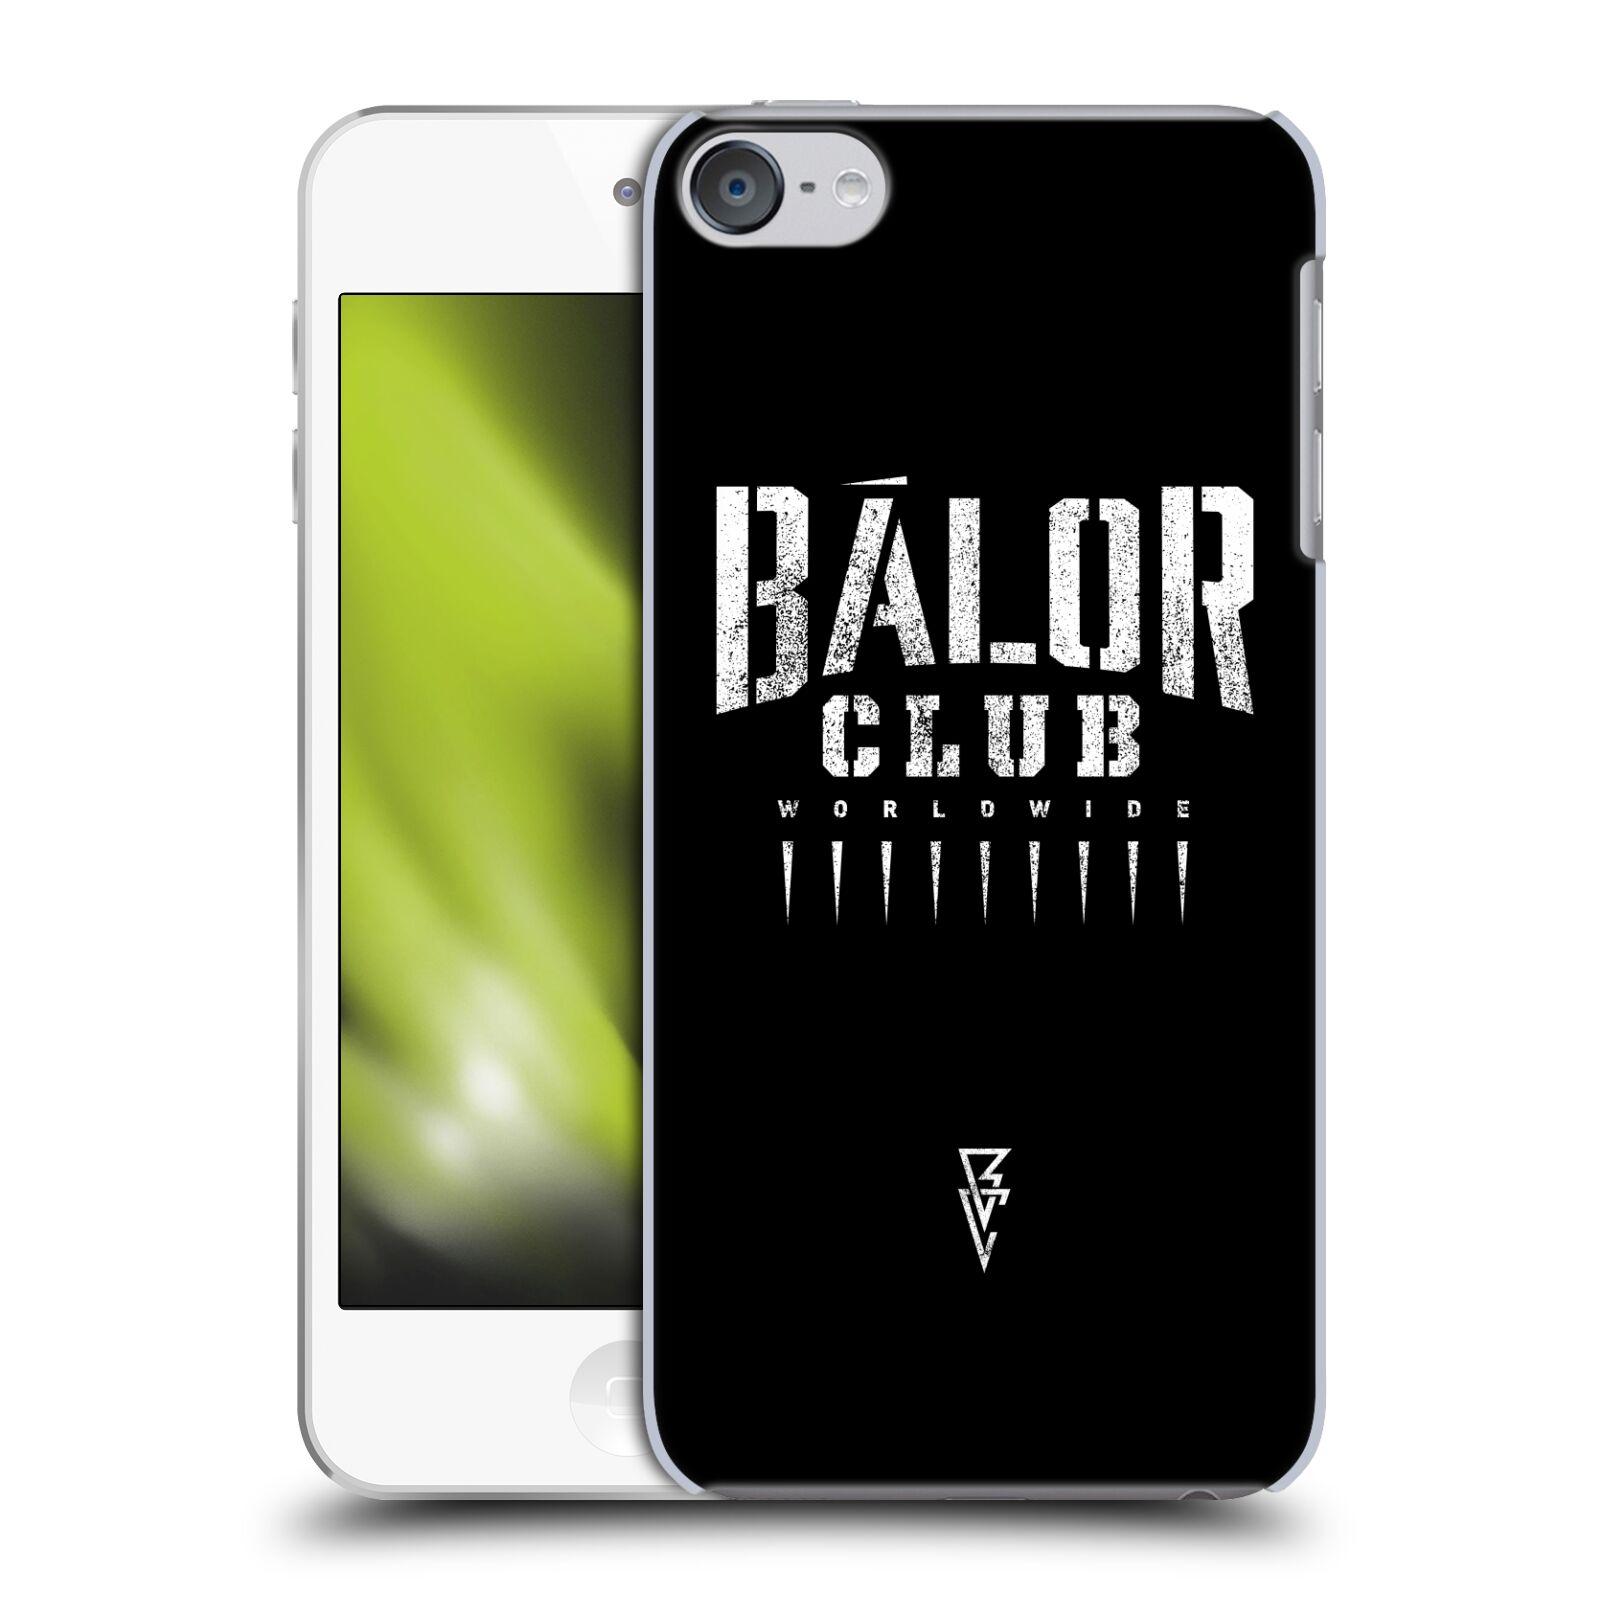 OFFICIAL-WWE-FINN-BALOR-HARD-BACK-CASE-FOR-APPLE-iPOD-TOUCH-MP3